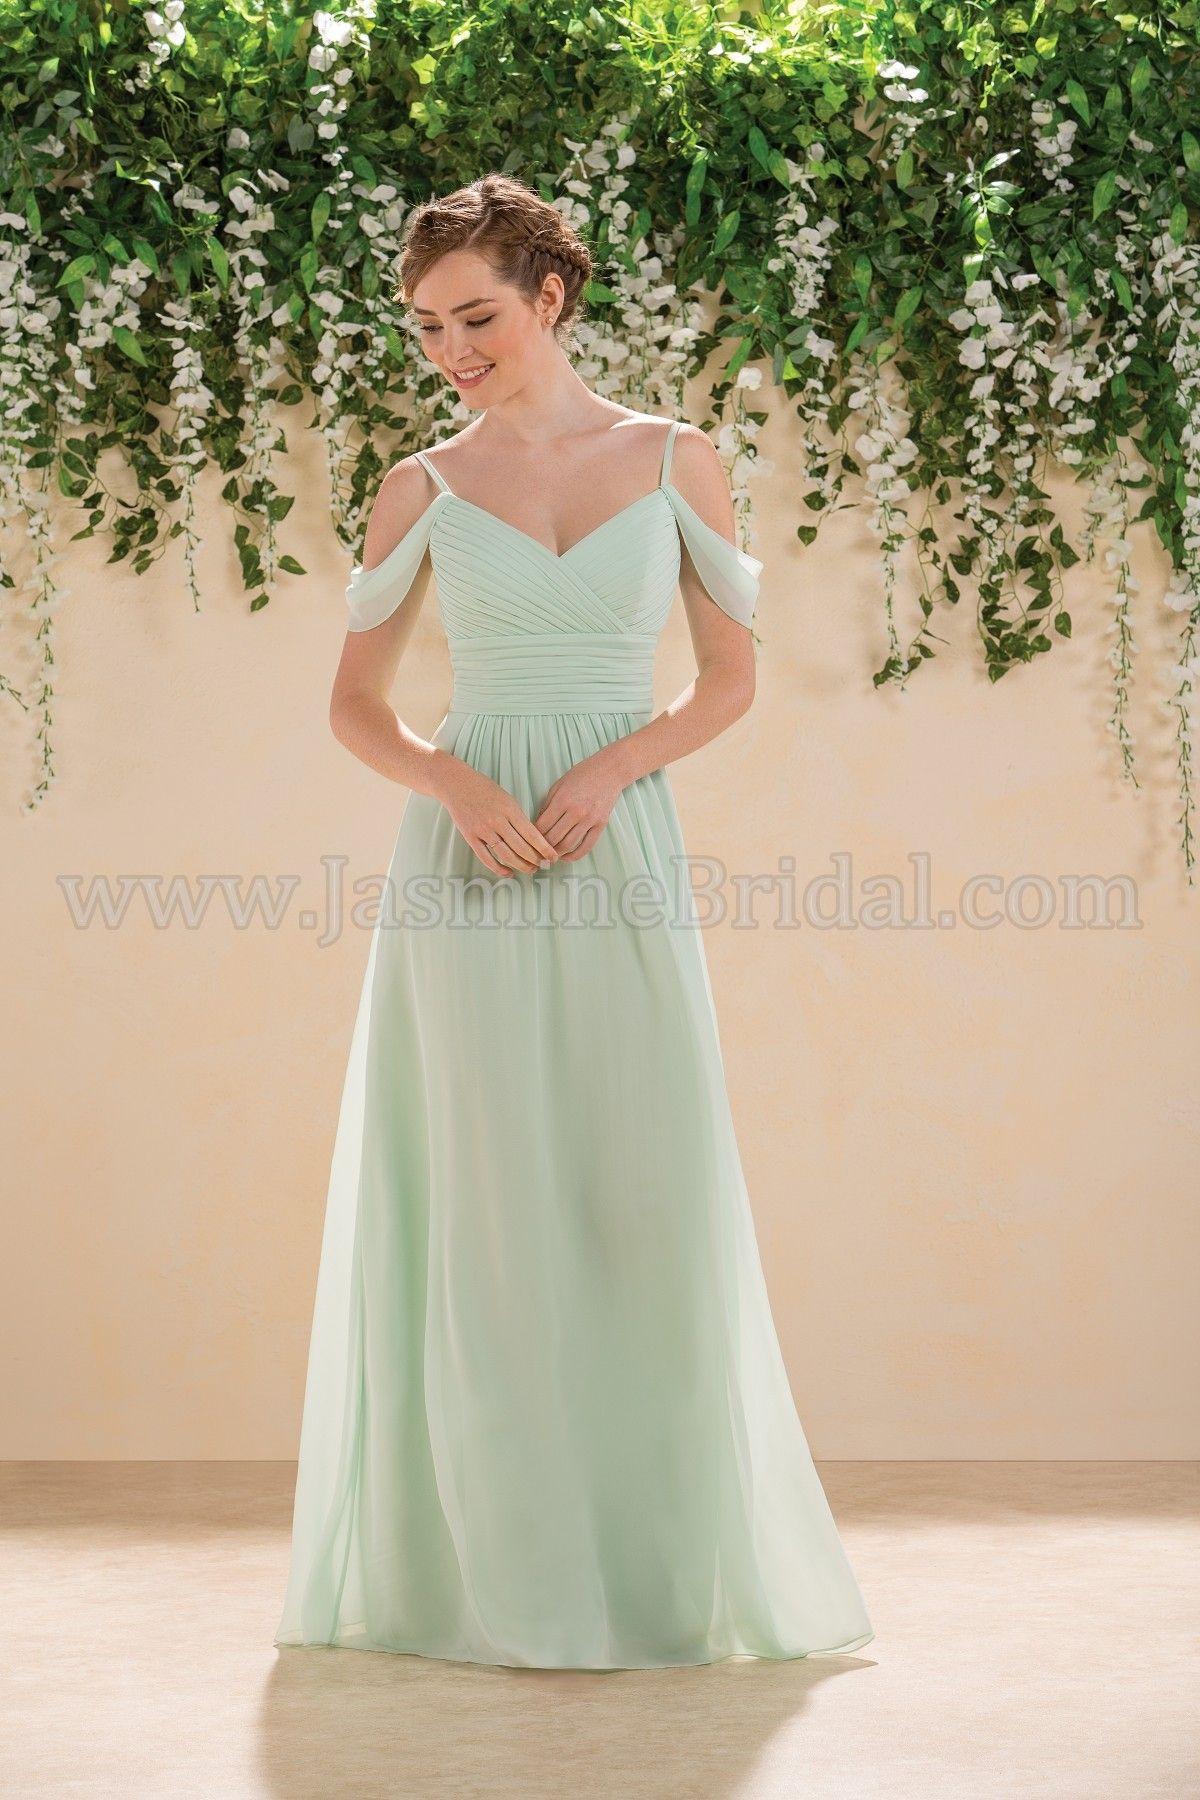 Jasmine bridal bridesmaid dress b2 style b183005 in seamist green jasmine bridal bridesmaid dress b2 style b183005 in seamist green ombrellifo Image collections